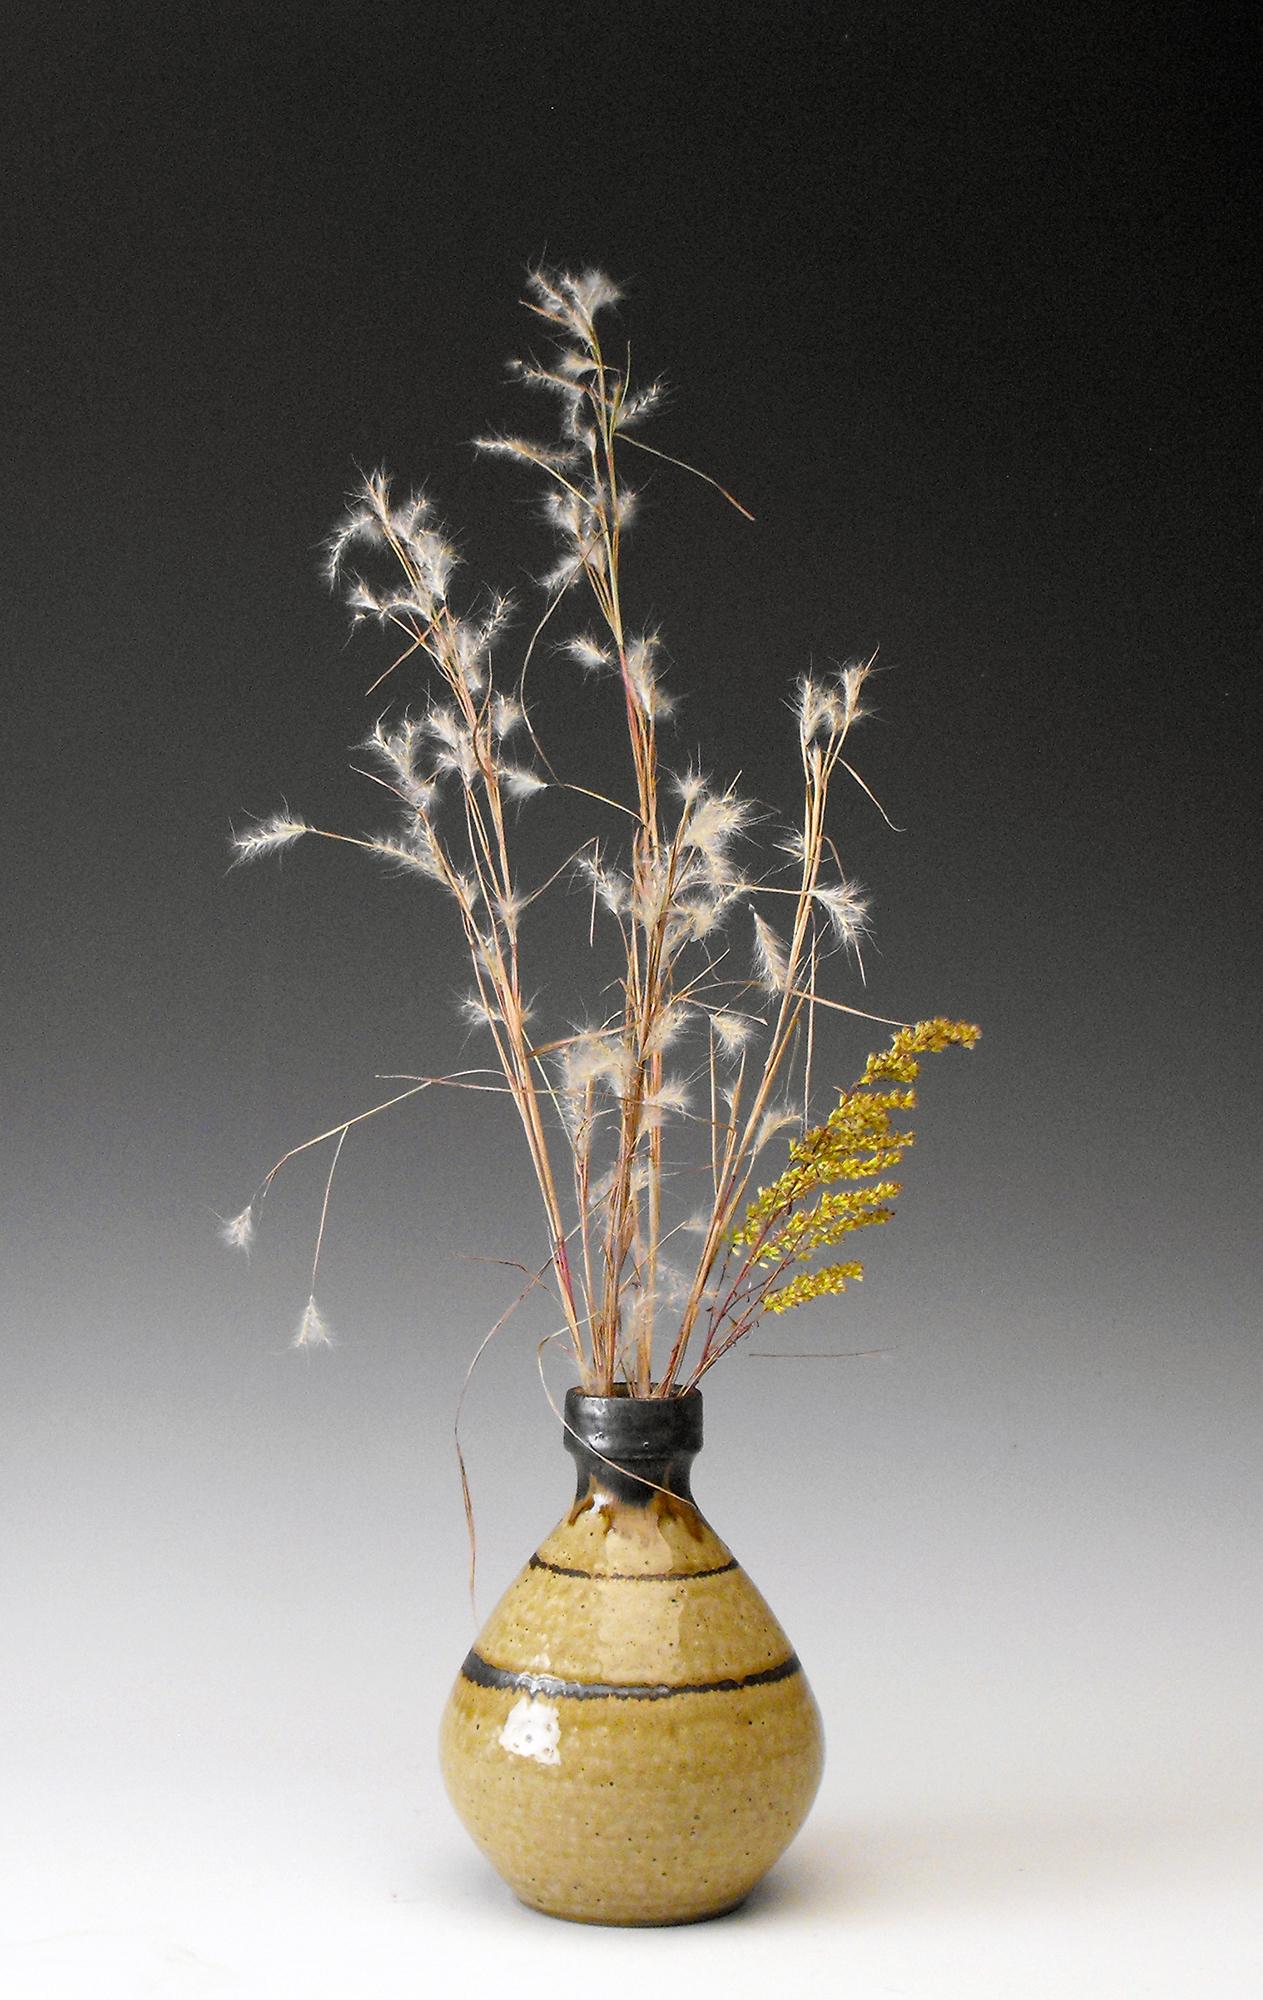 bud vase with plants.jpg